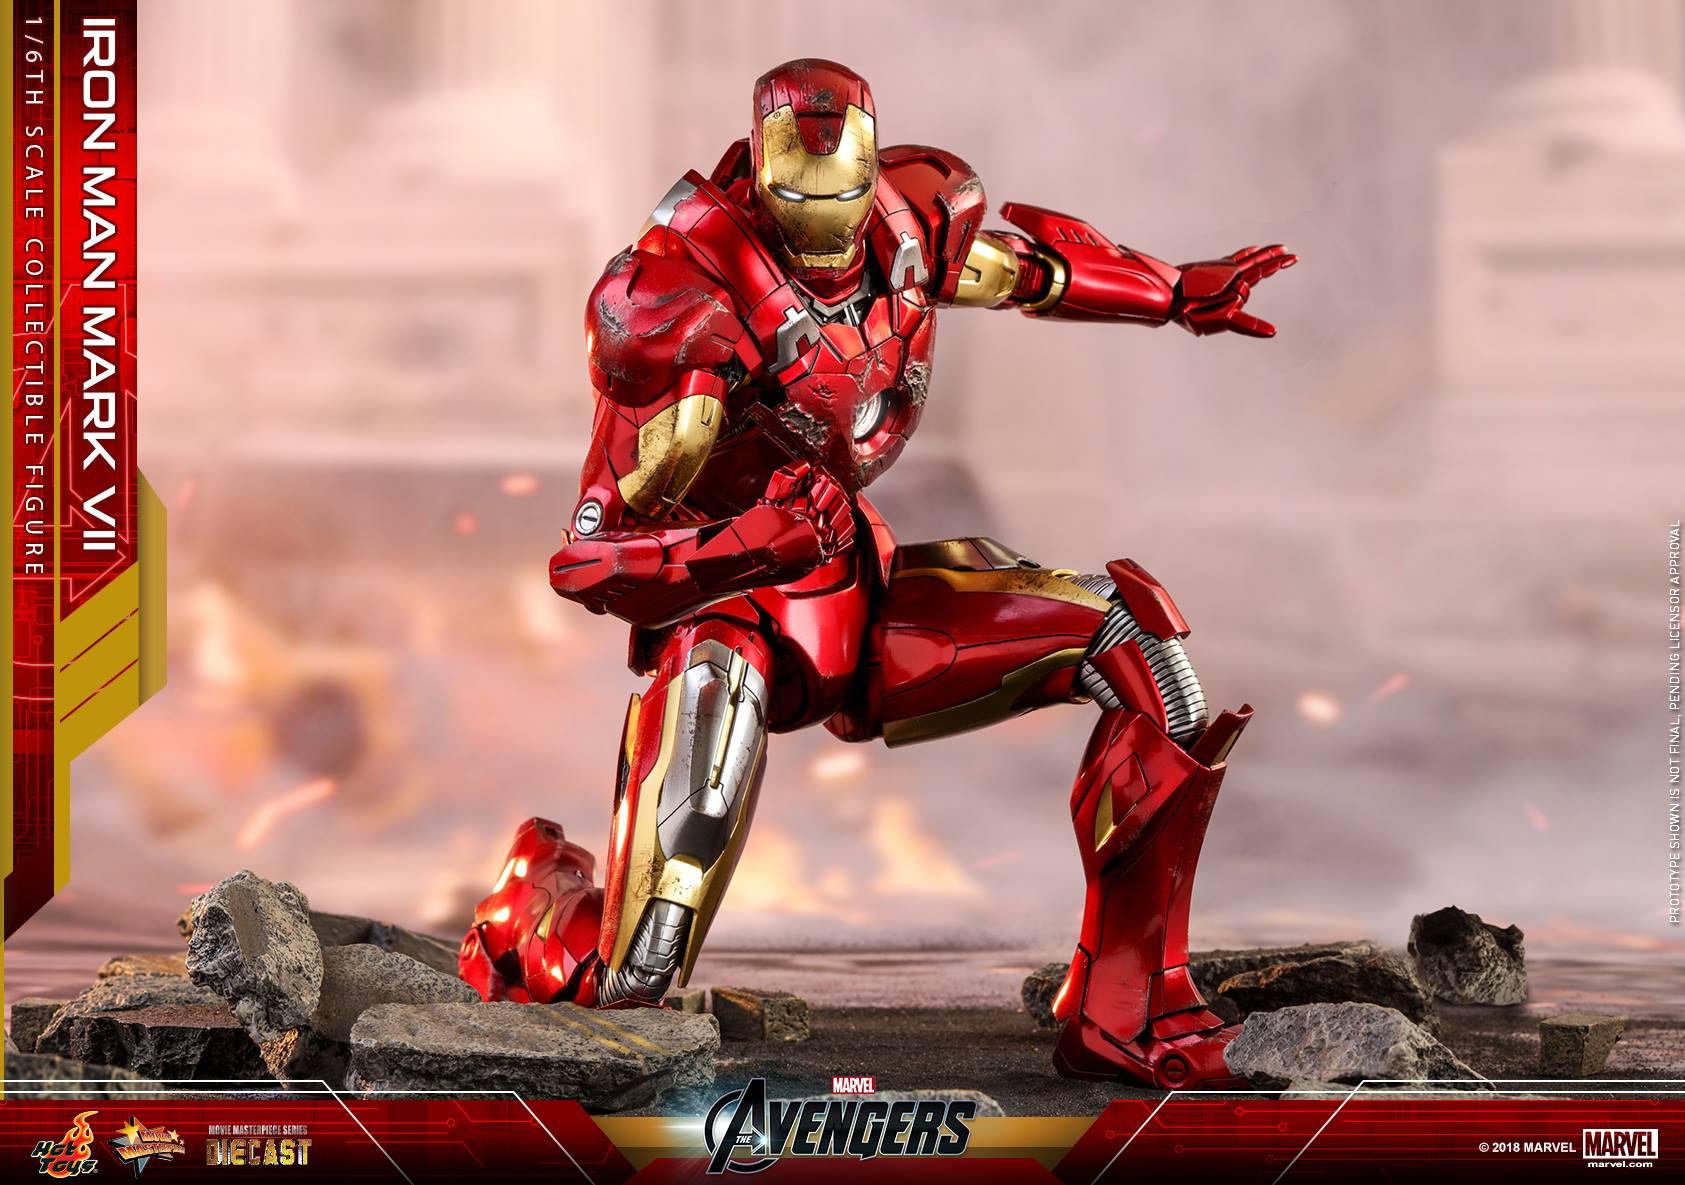 The Avengers - Iron Man Mark VII (7) 1/6 (Hot Toys) Mj1Rko3n_o